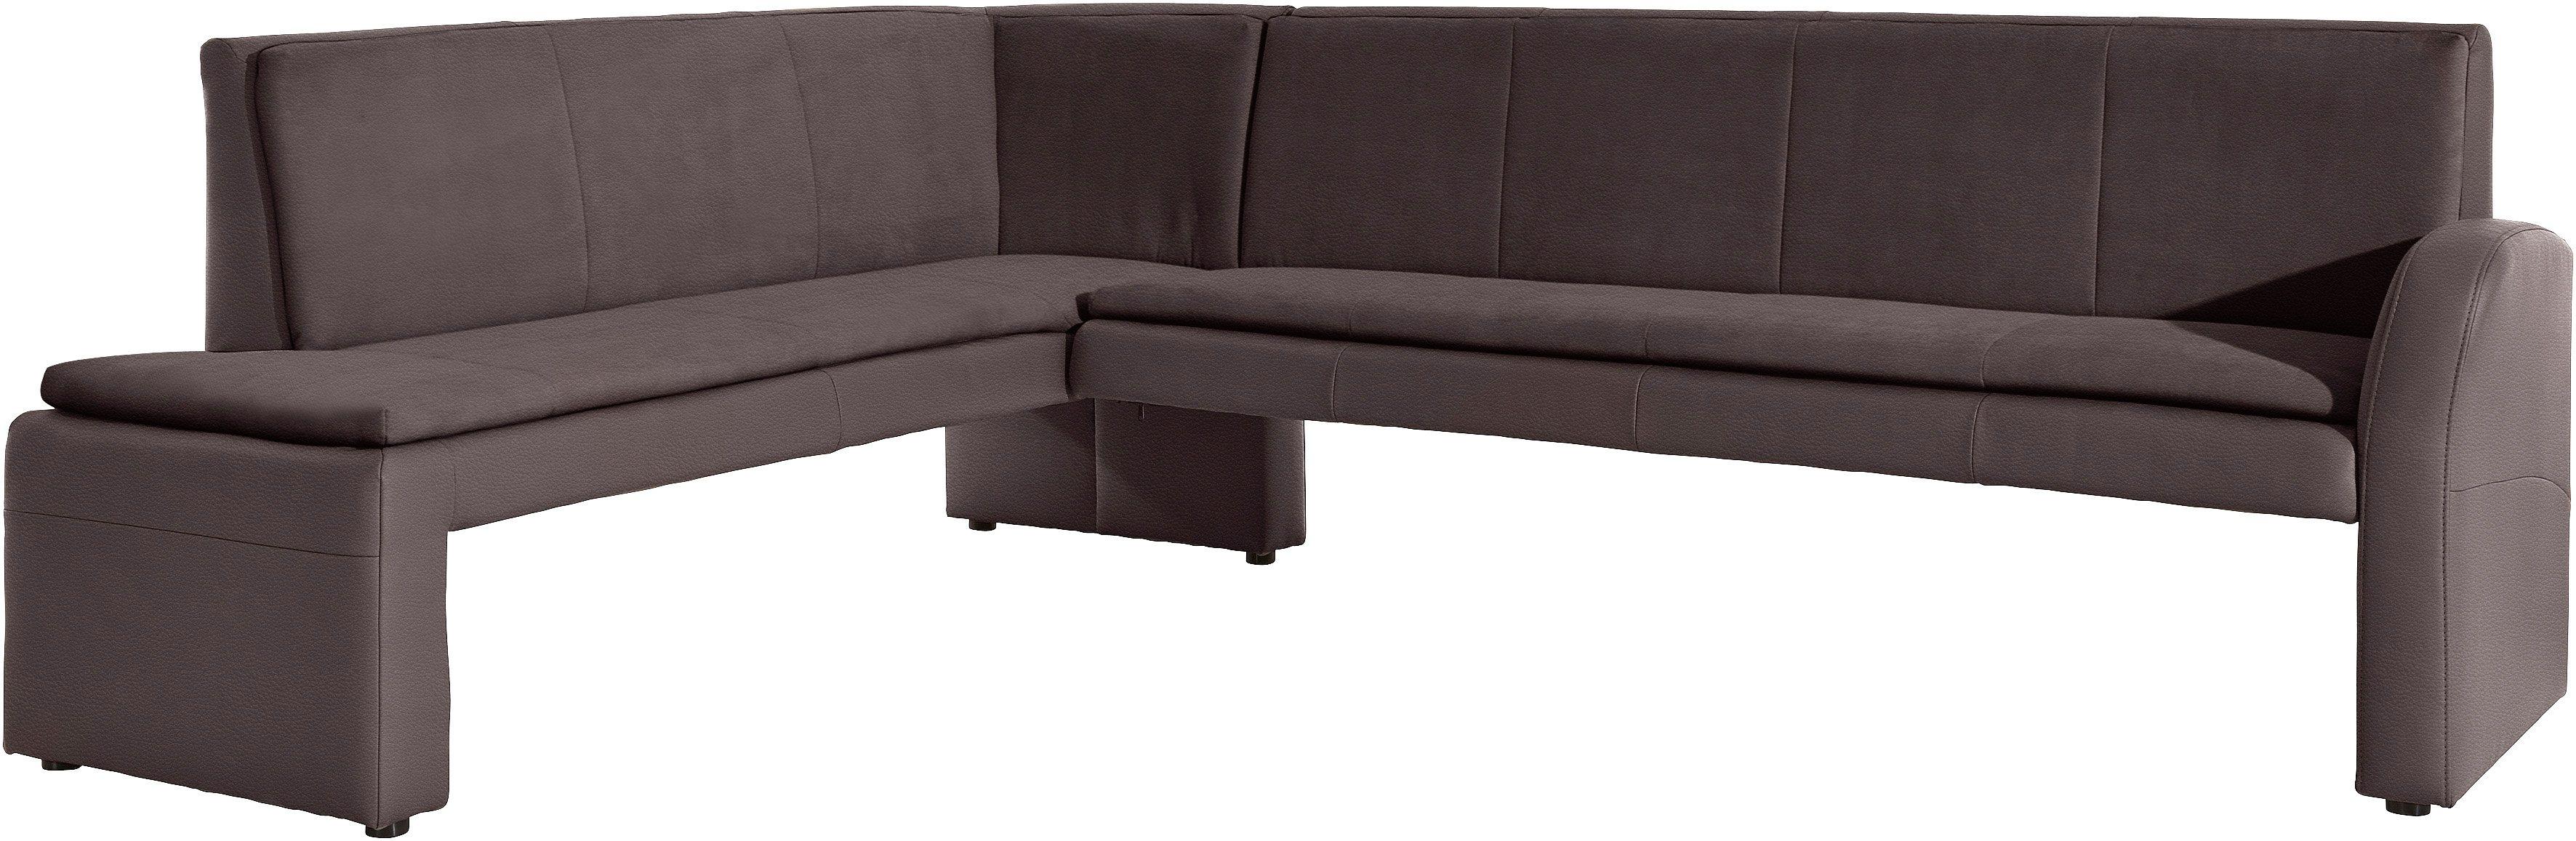 lila violett materialmix eckb nke online kaufen m bel suchmaschine. Black Bedroom Furniture Sets. Home Design Ideas